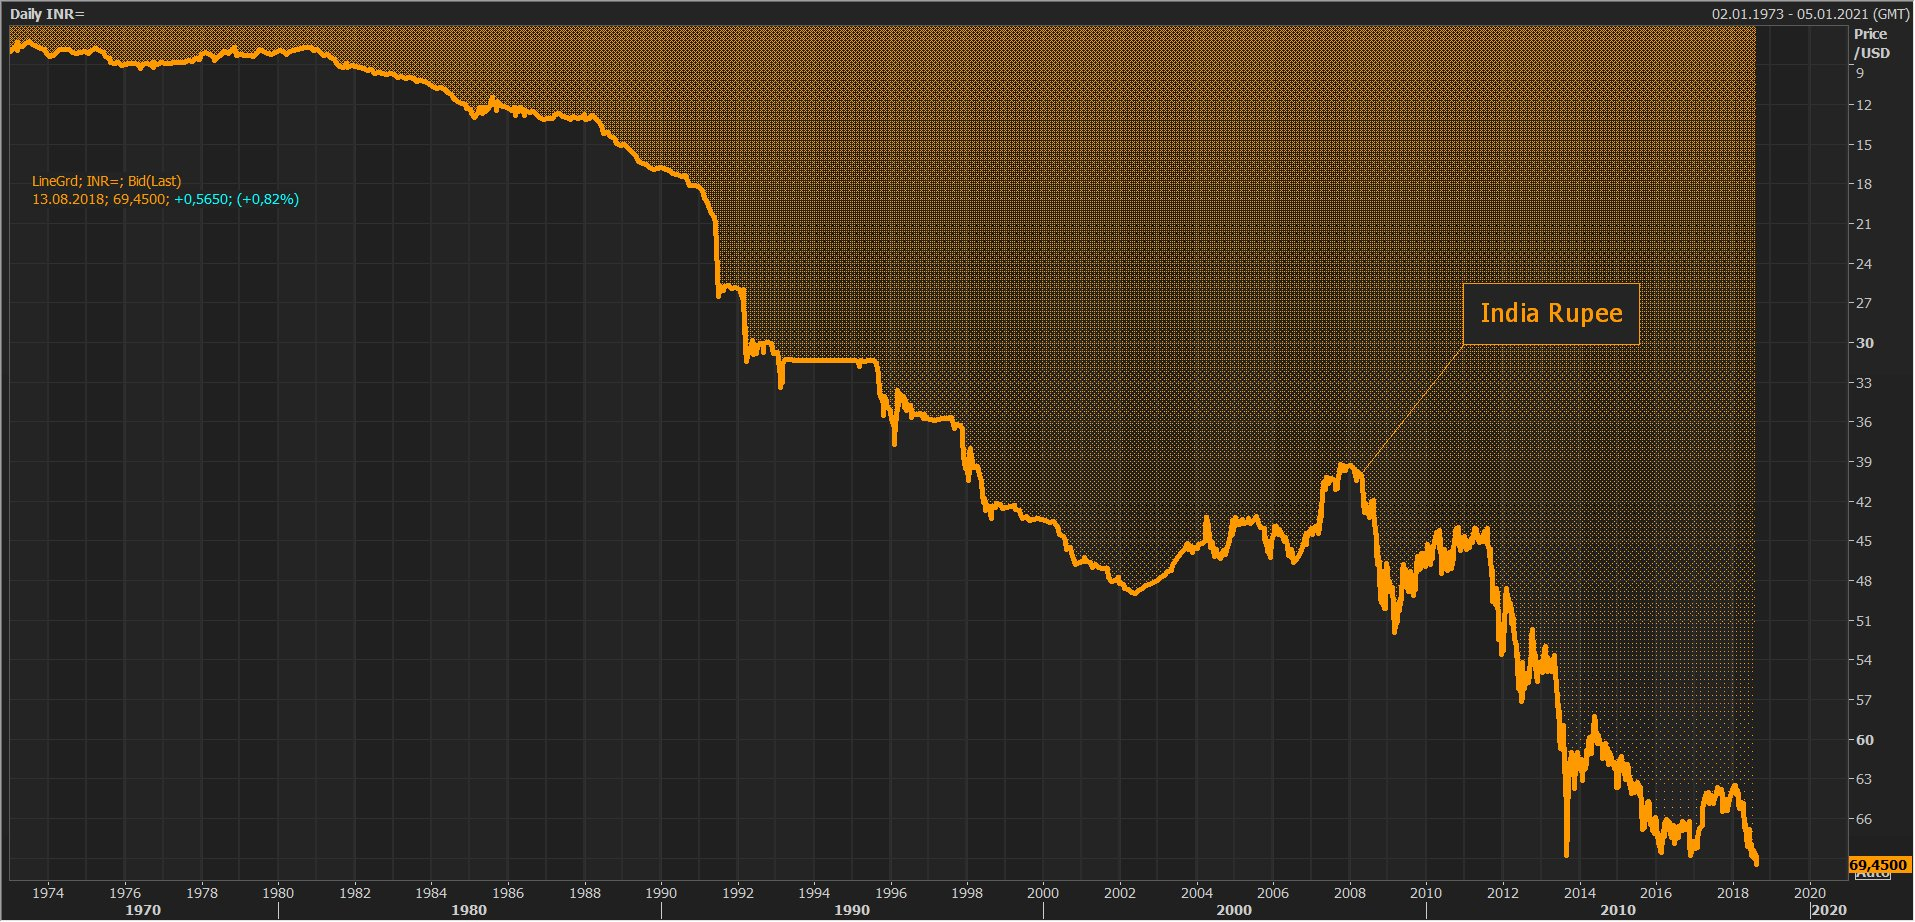 RT @Schuldensuehner: #India Rupee hit…